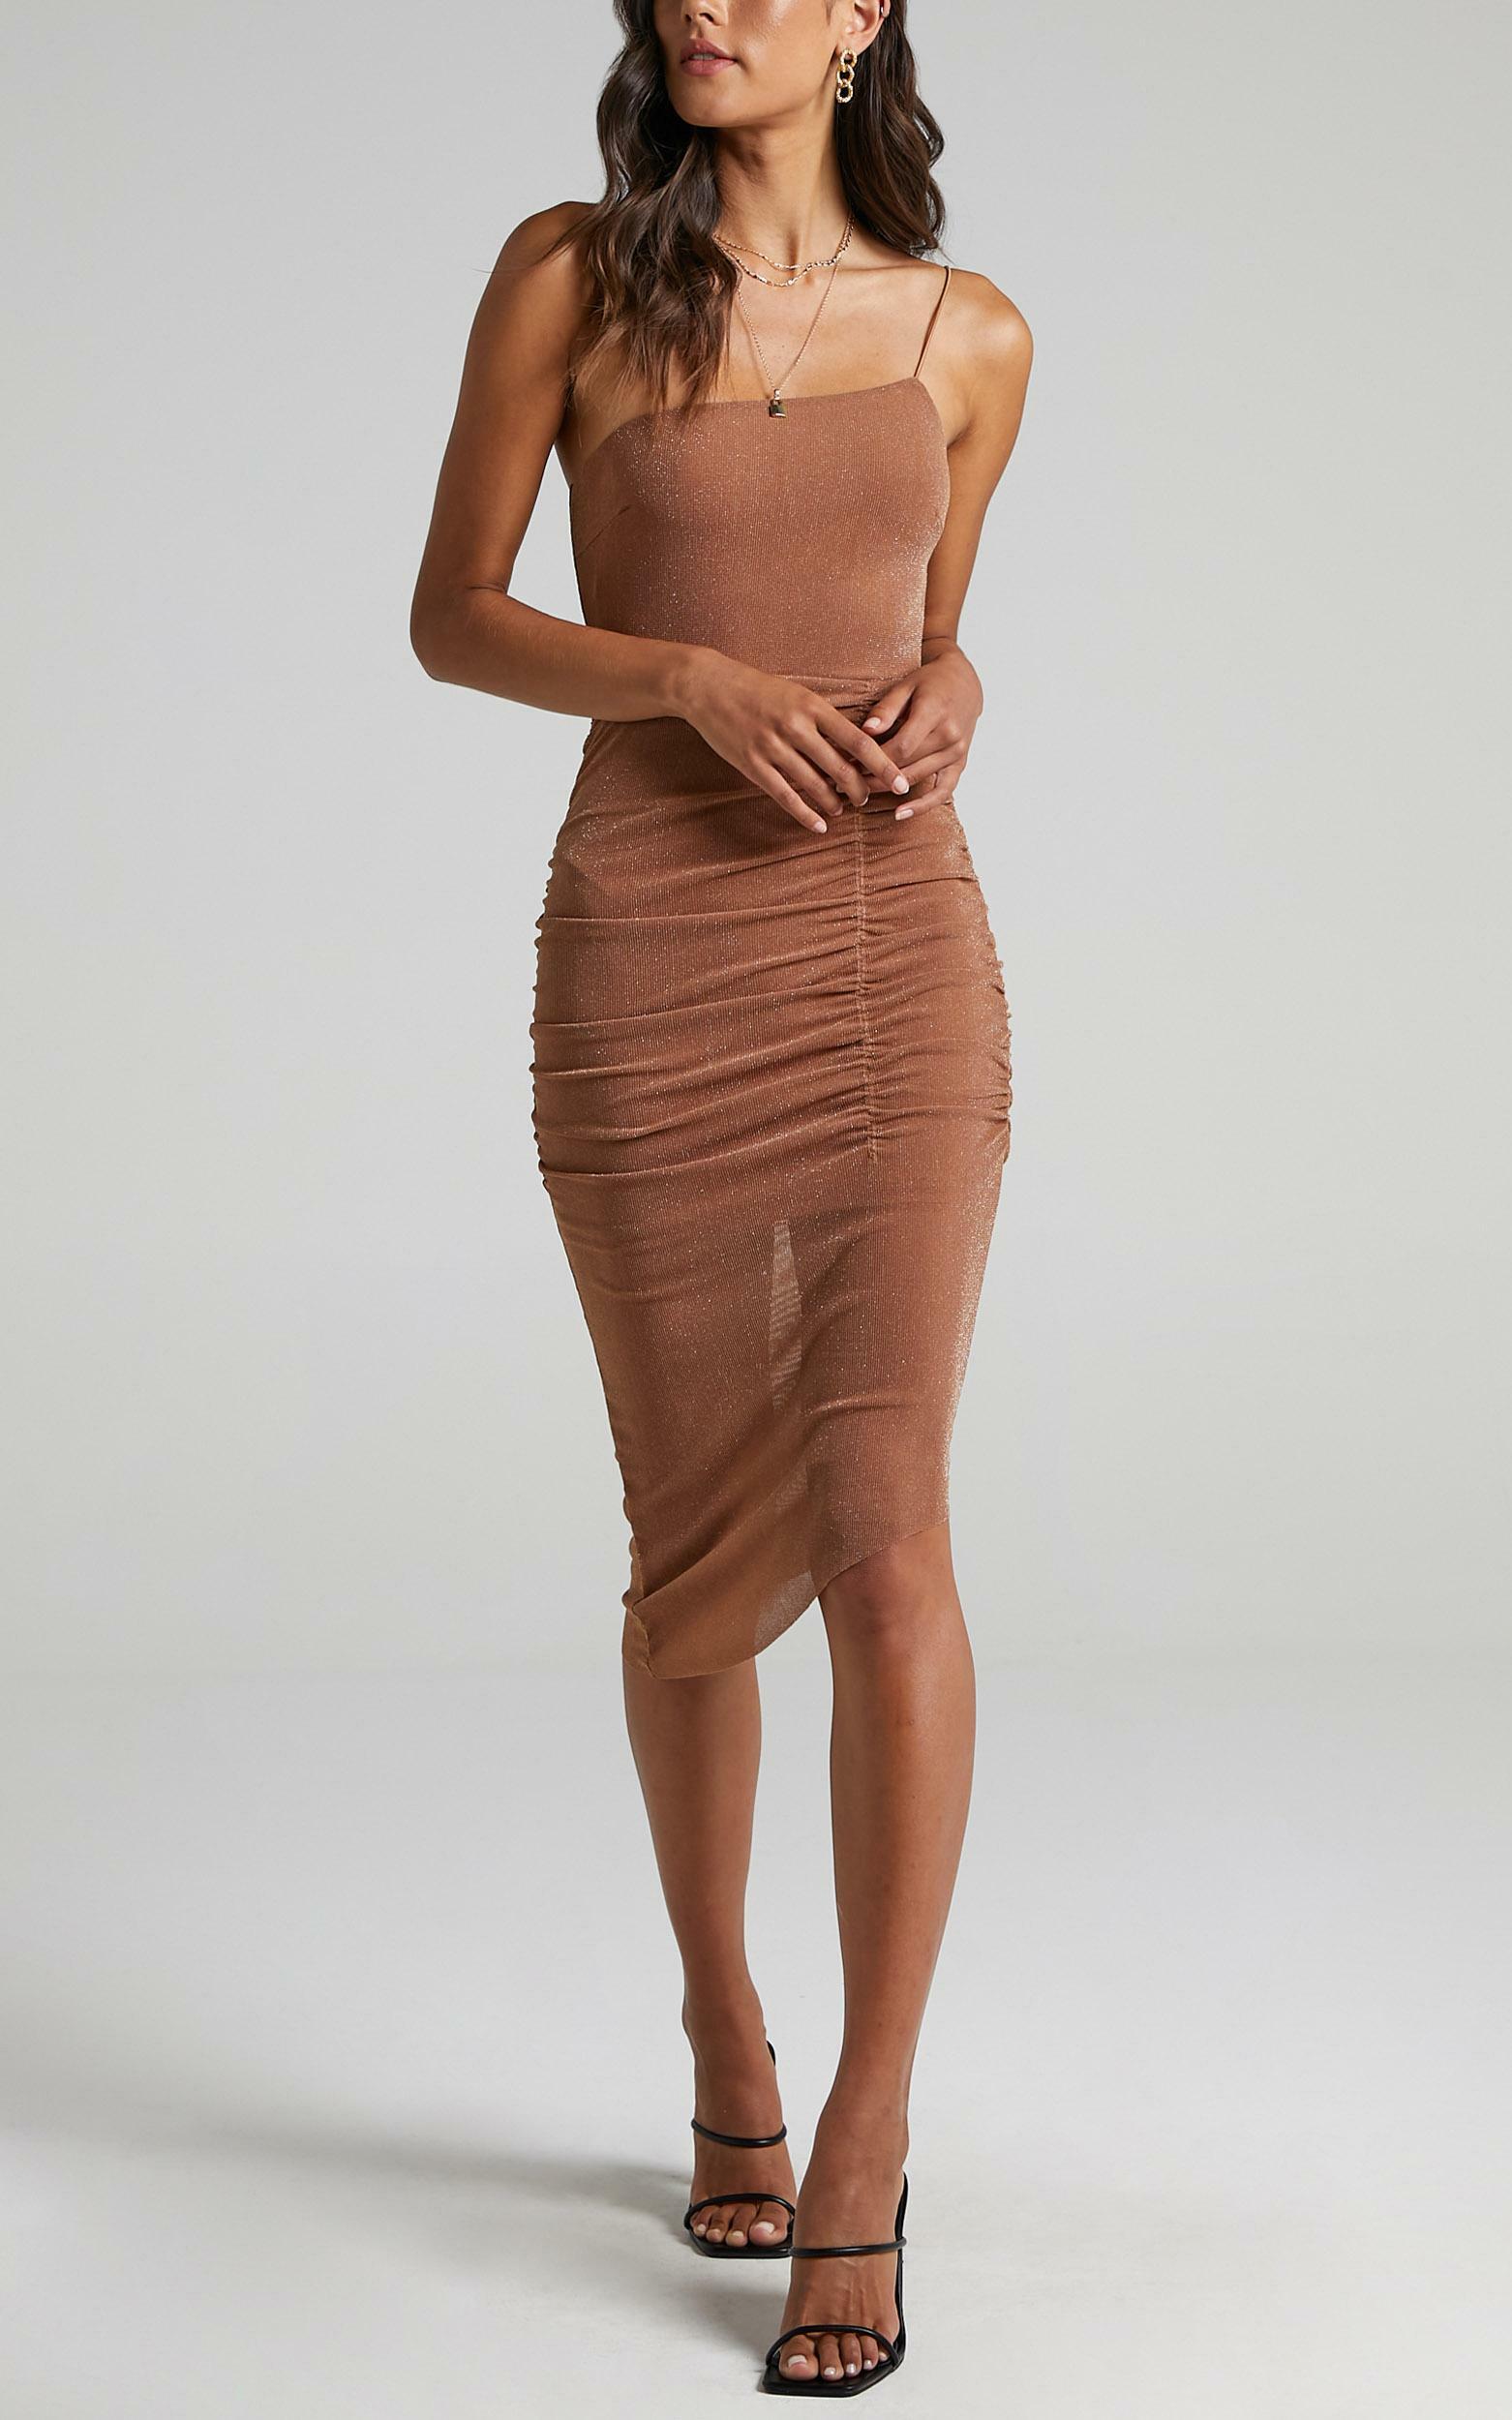 Annelie Dress in Tan Lurex - 06, BRN1, hi-res image number null